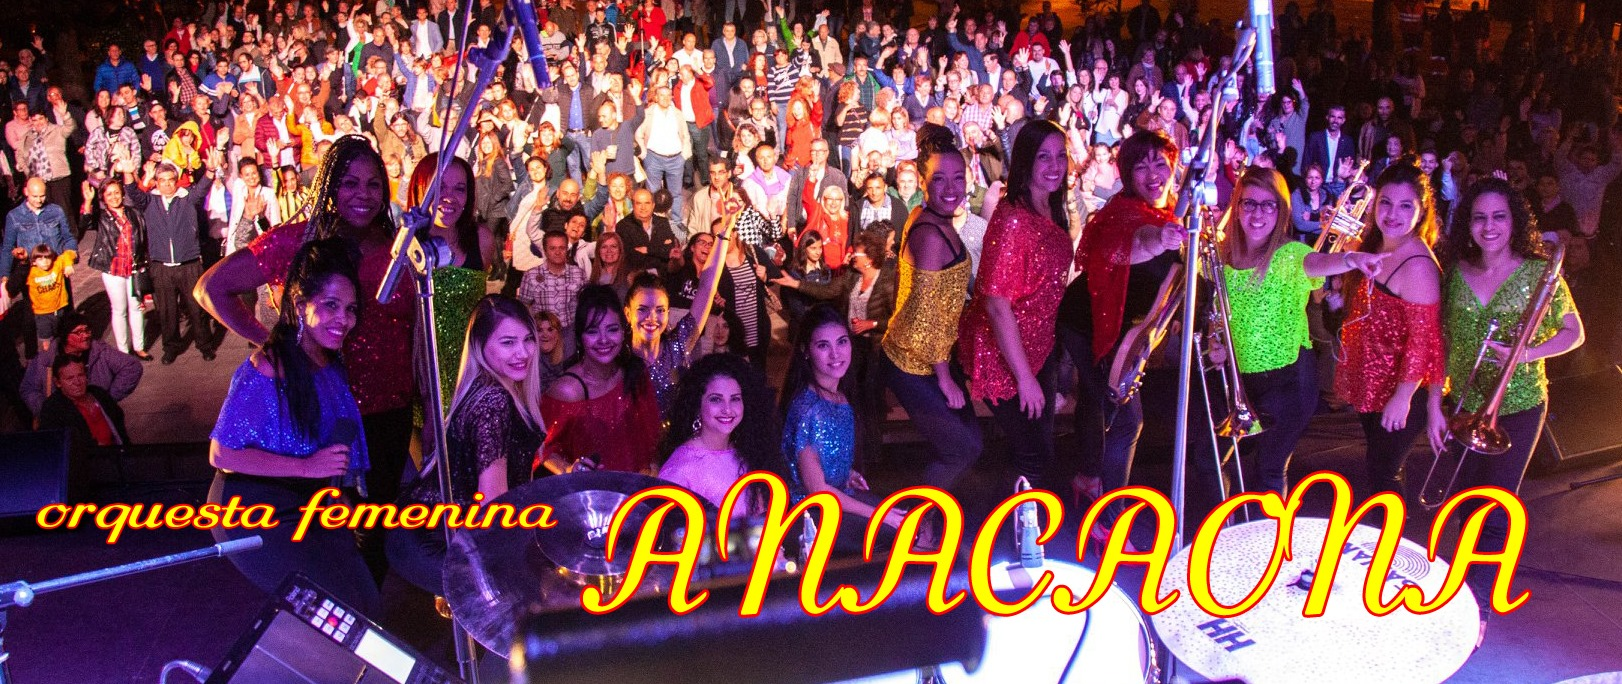 Anacaona The Cuban Female Orchestra